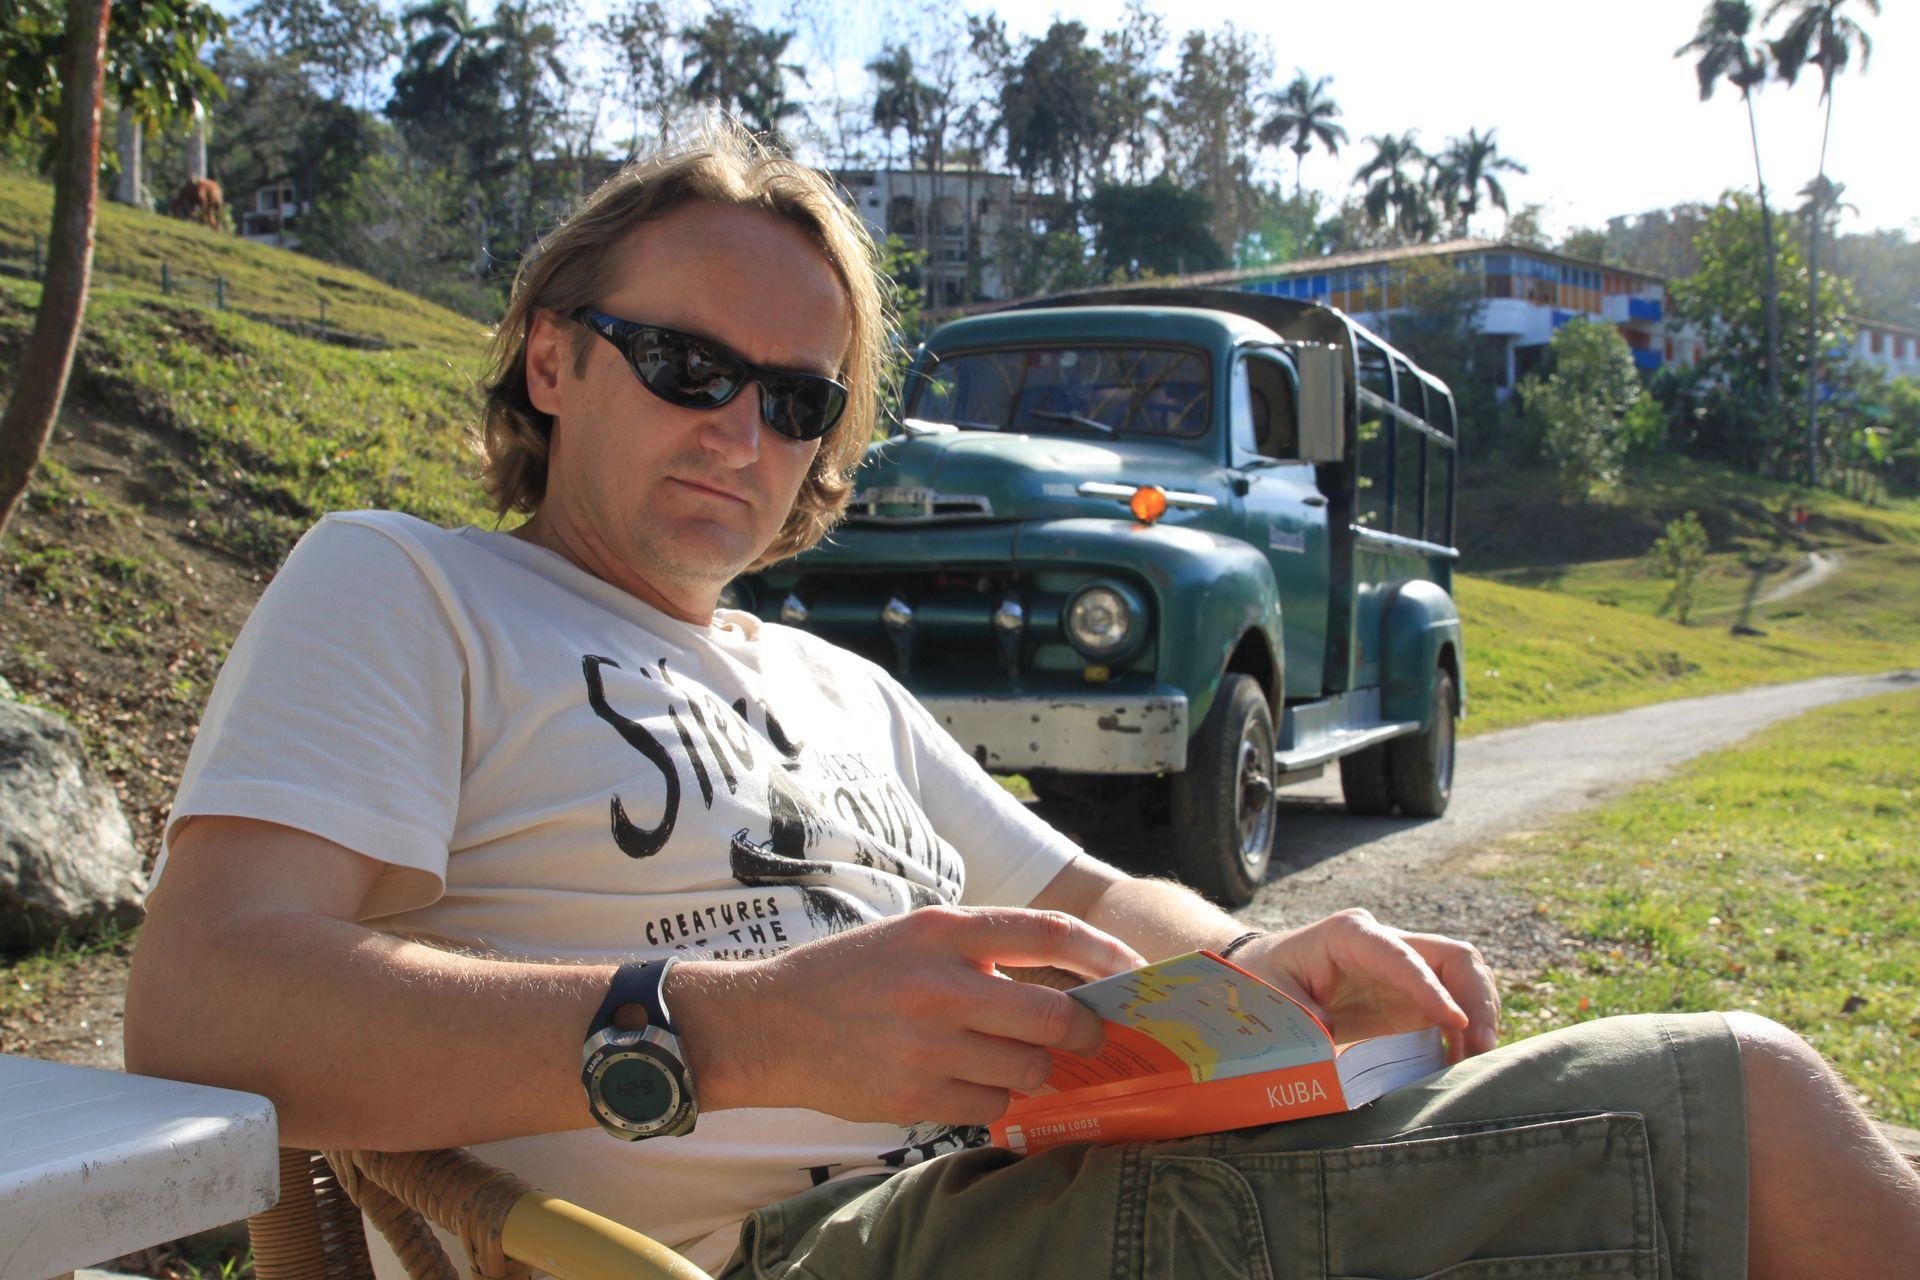 Wolfgang beim Urlauben auf Kuba